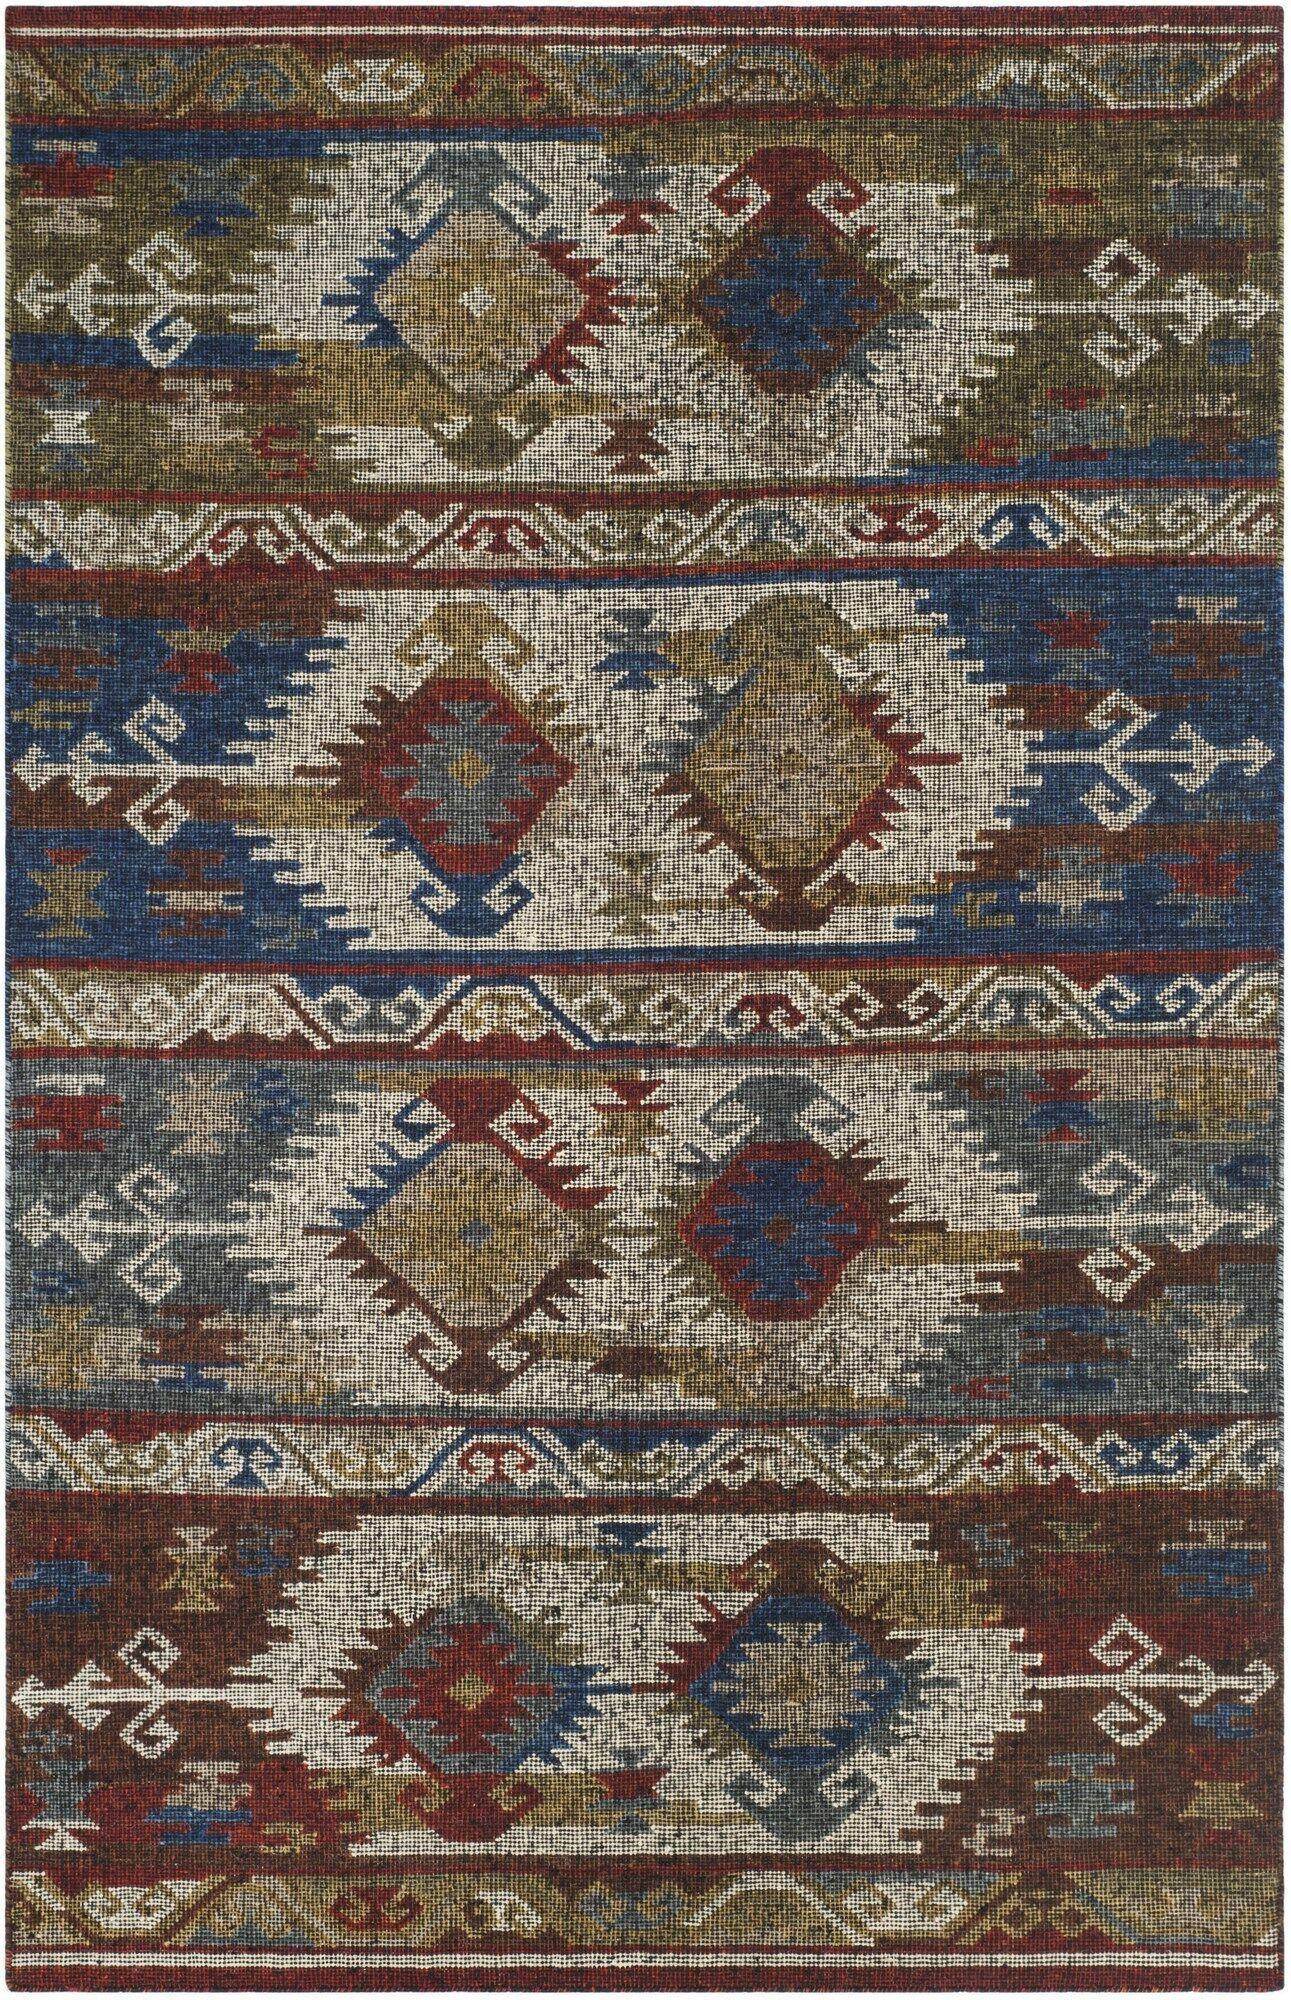 Elan Hand-Woven Blue Area Rug Rug Size: Rectangle 5' x 8'